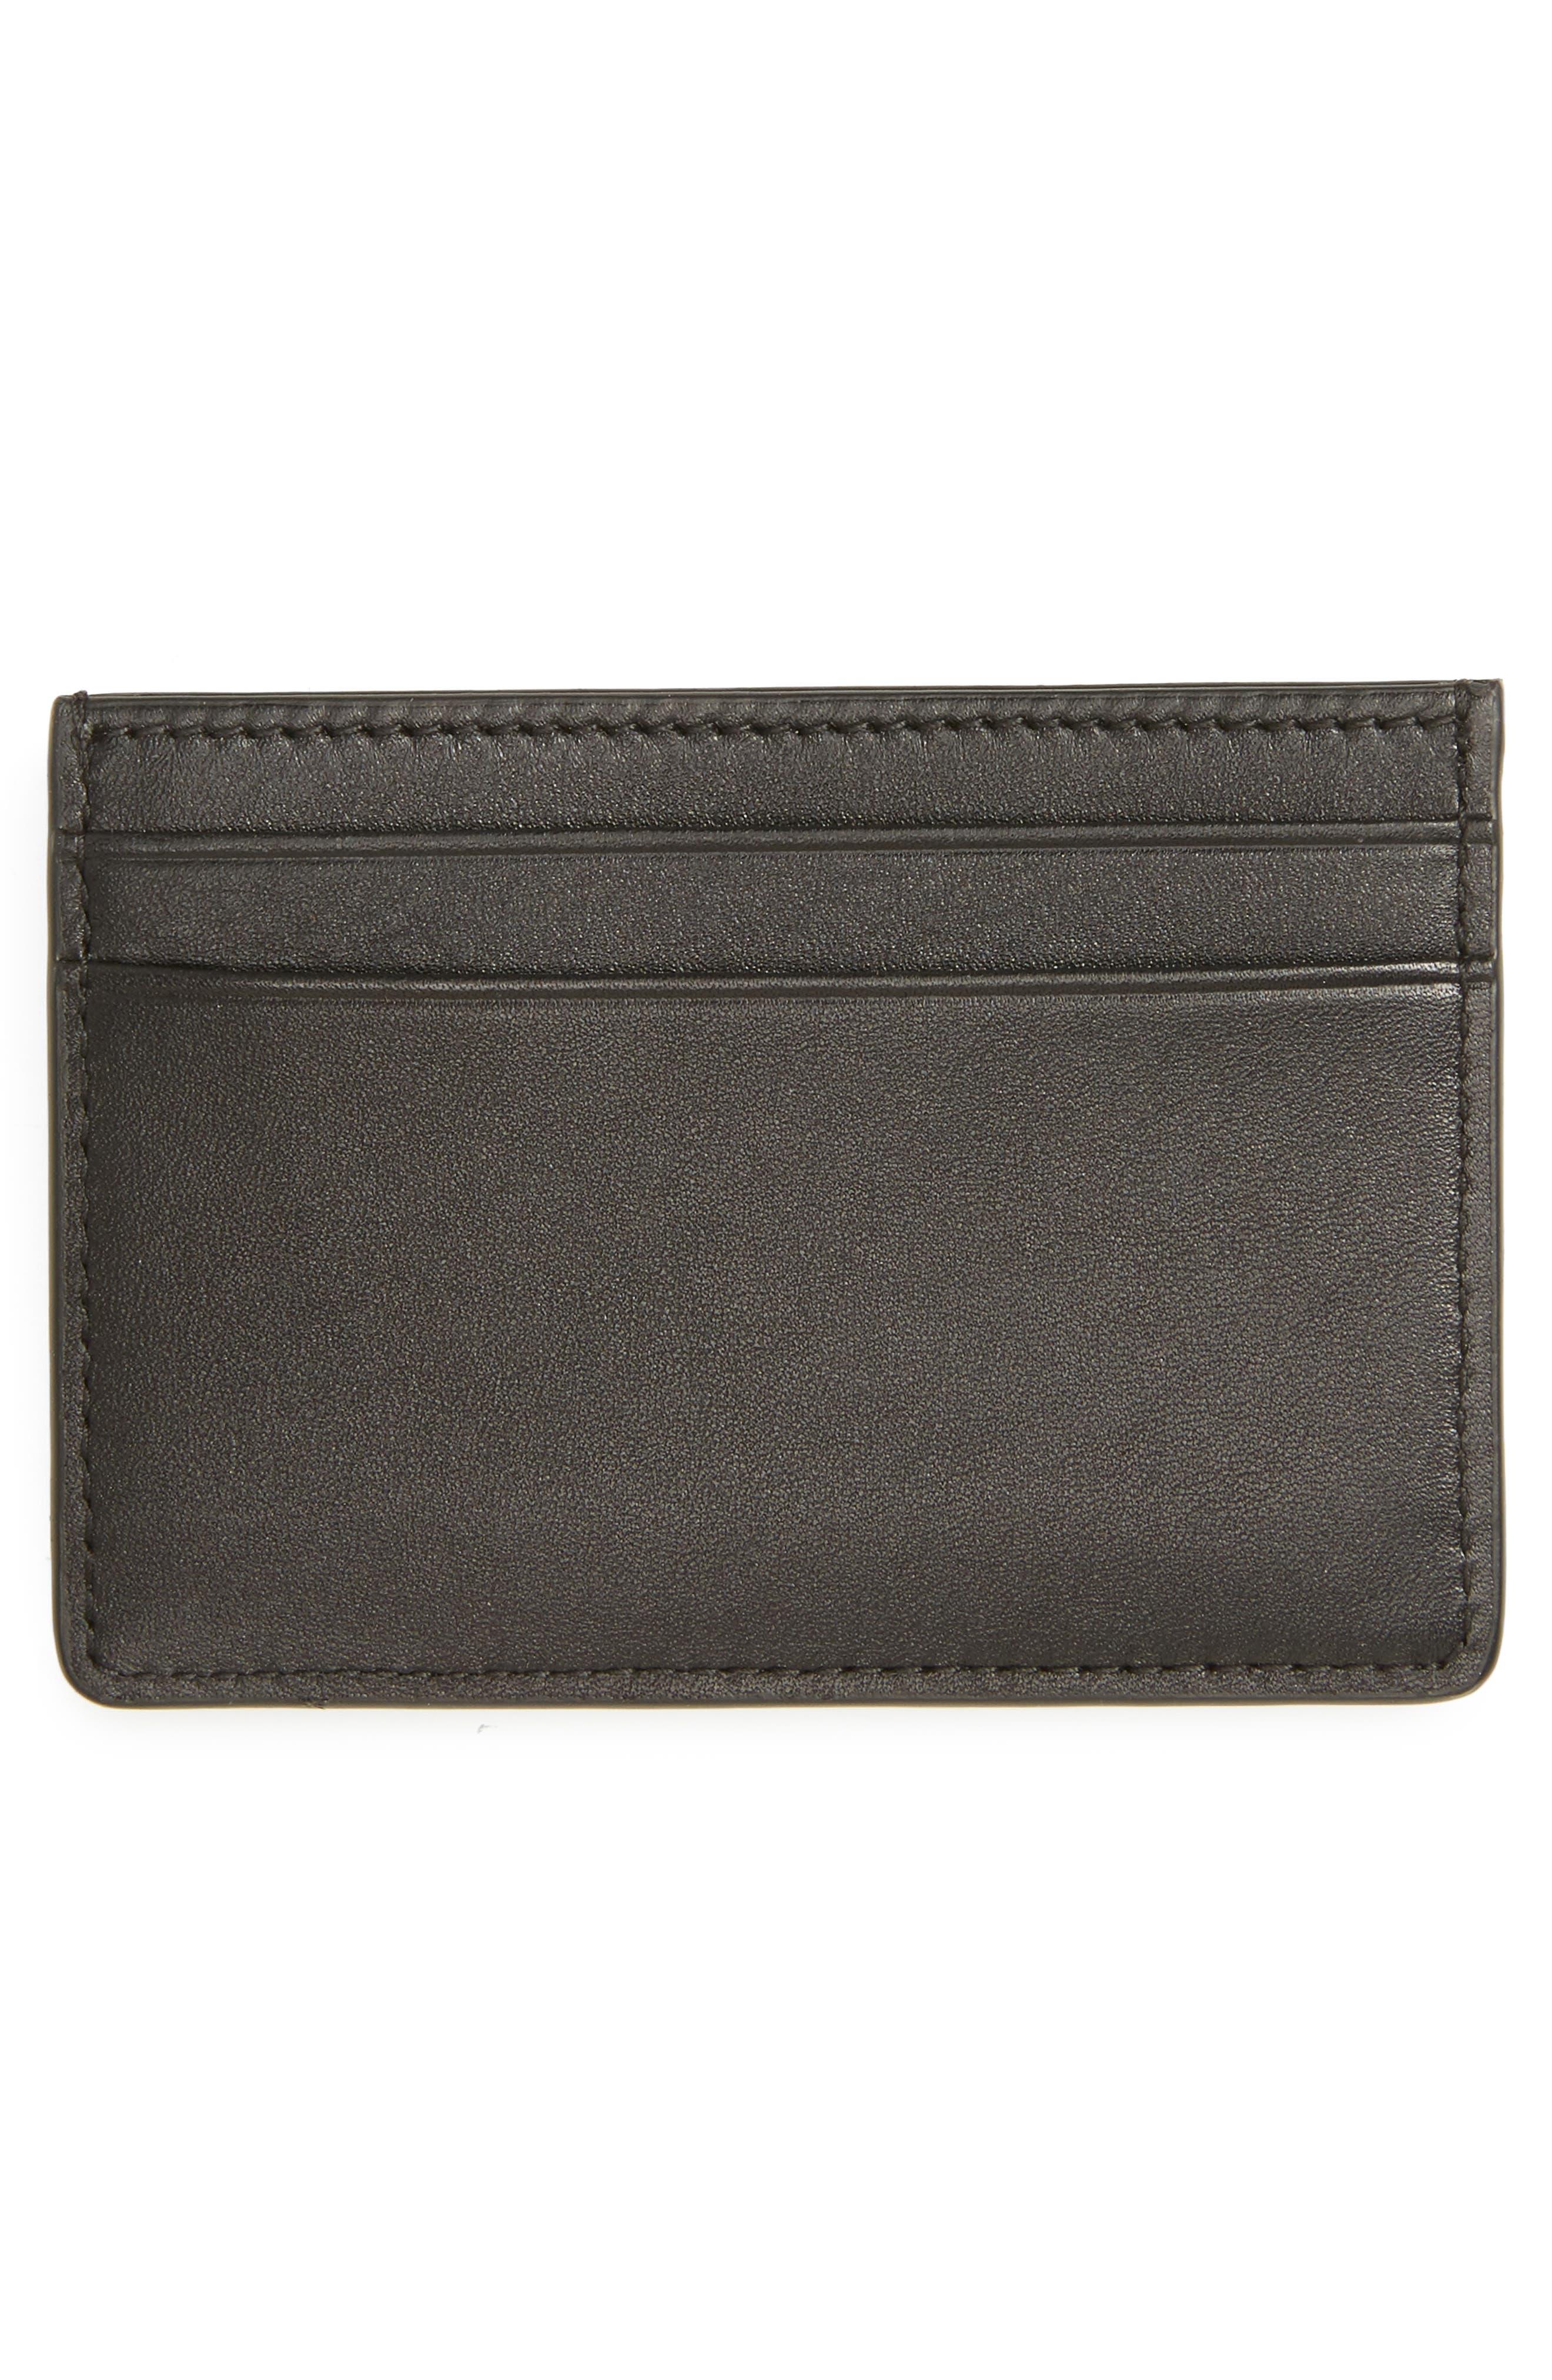 Focus Leather Card Case,                             Alternate thumbnail 2, color,                             001